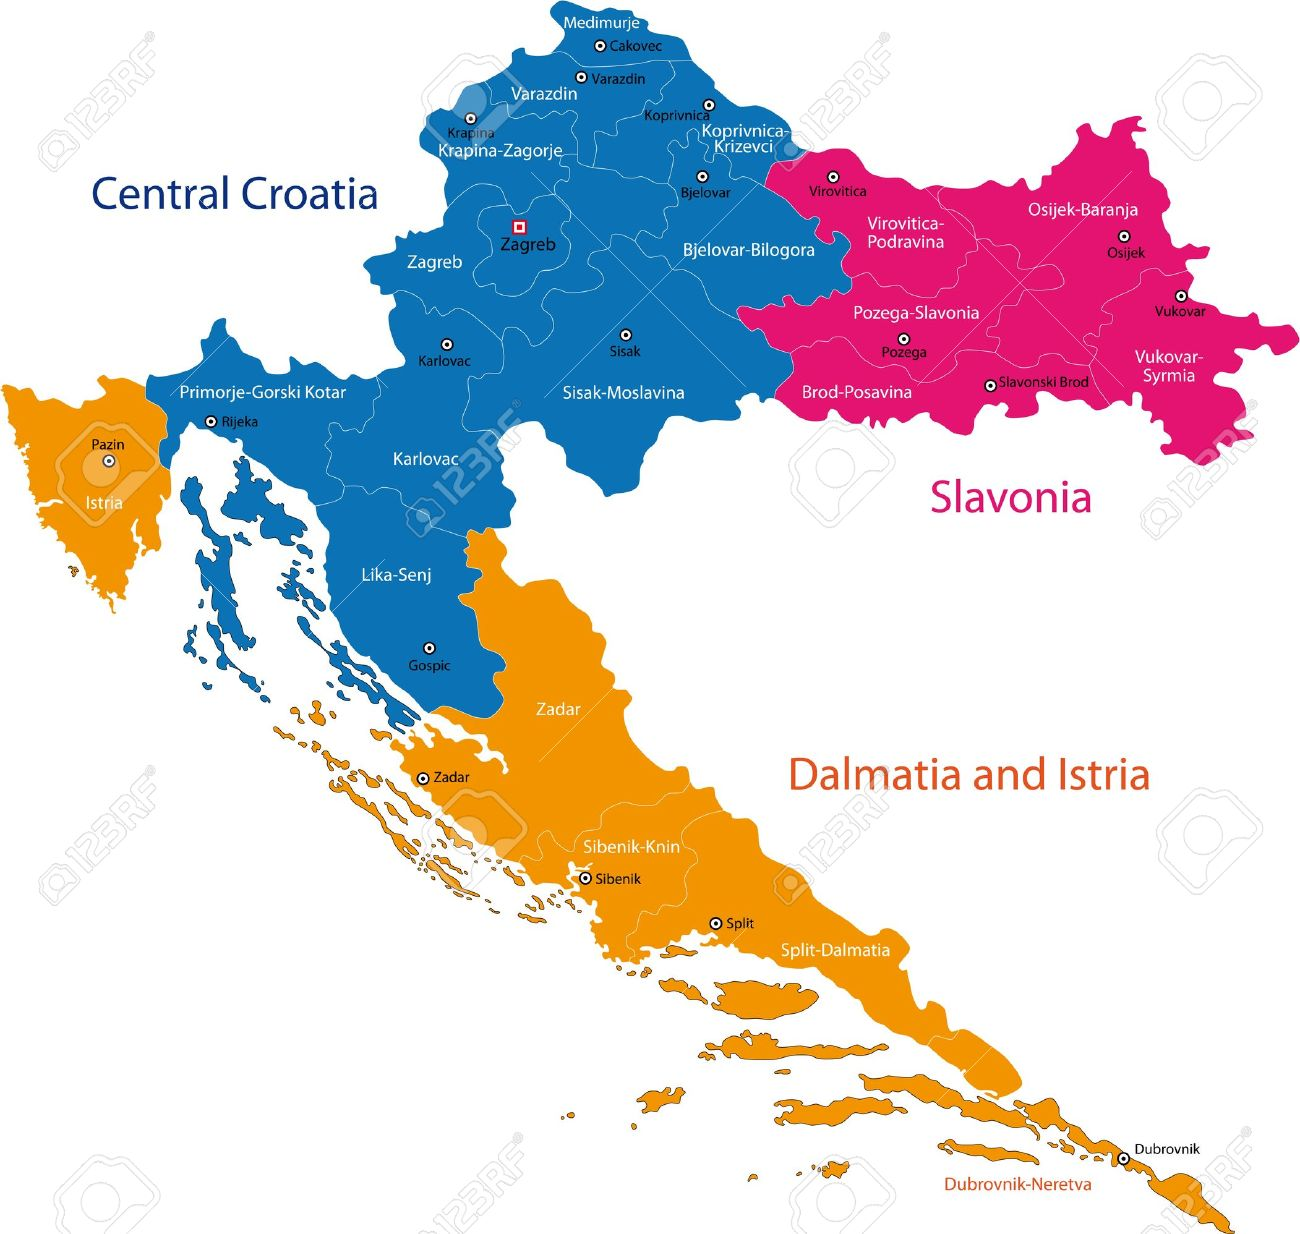 Carte Administrative Croatie.Carte Des Divisions Administratives De La Republique De Croatie